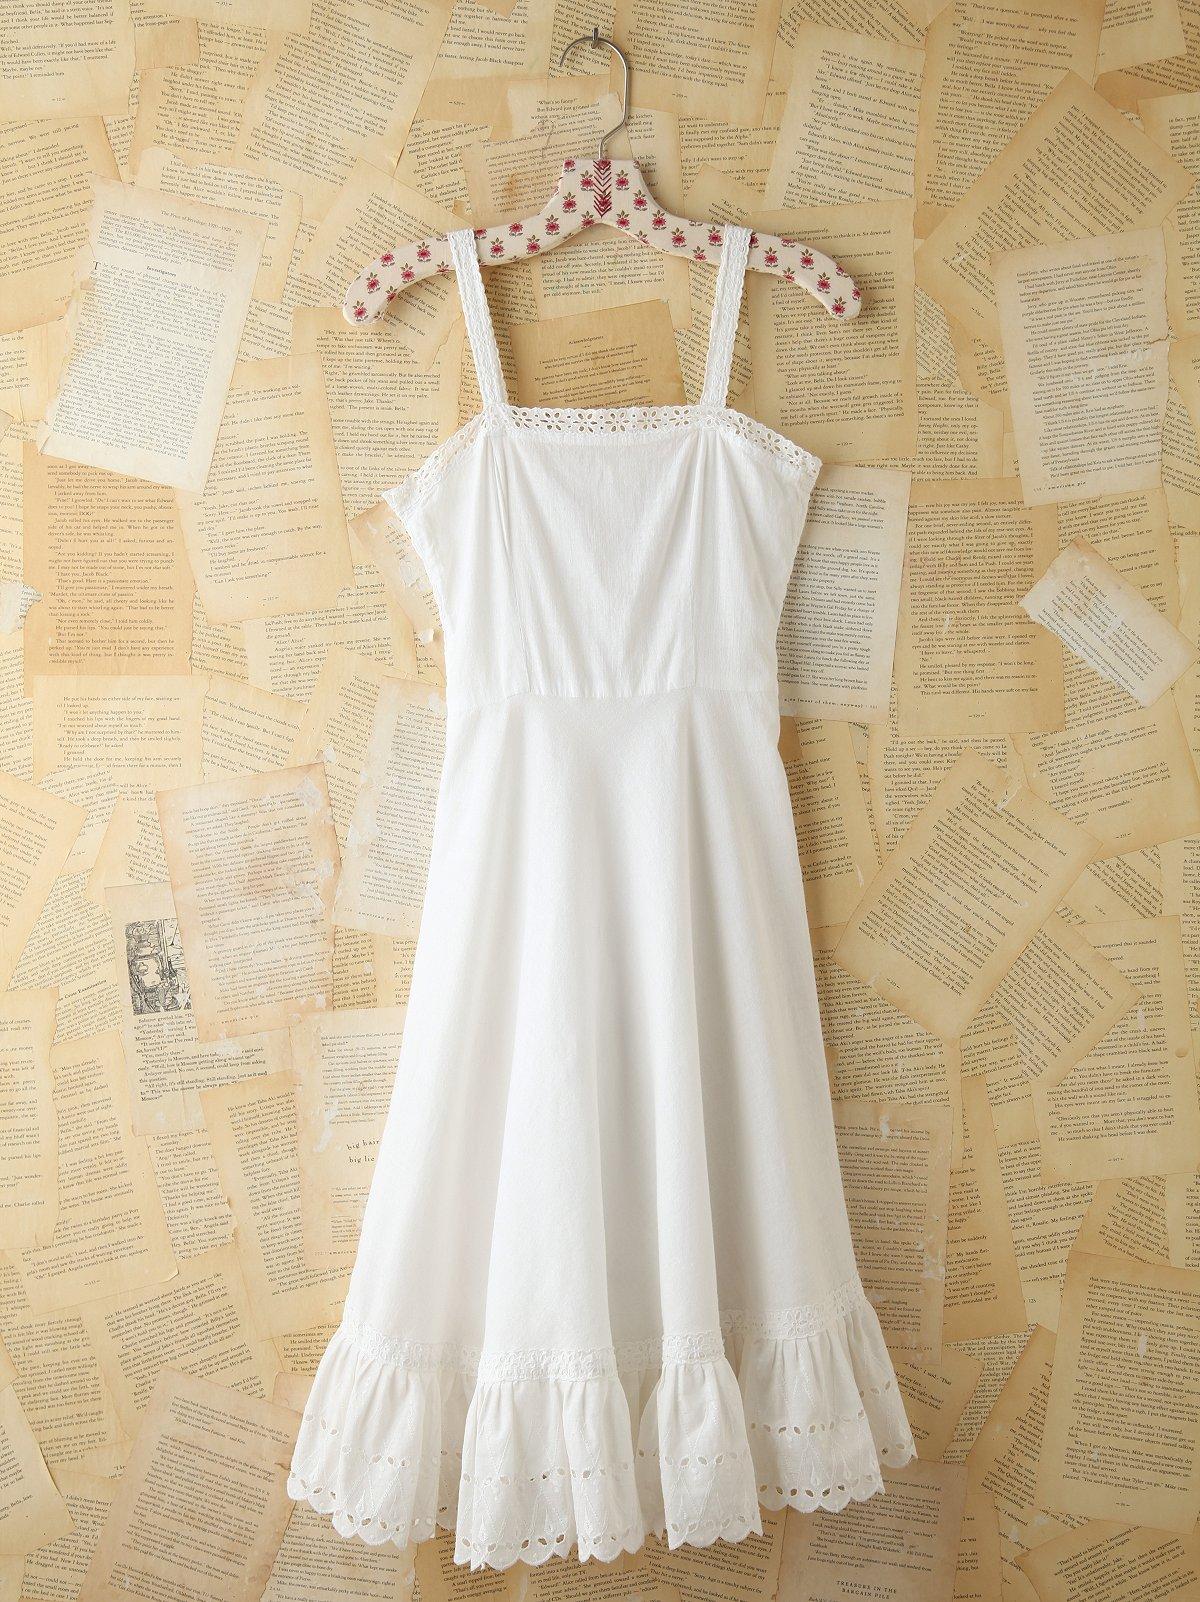 Vintage 1930 Eyelet Dress